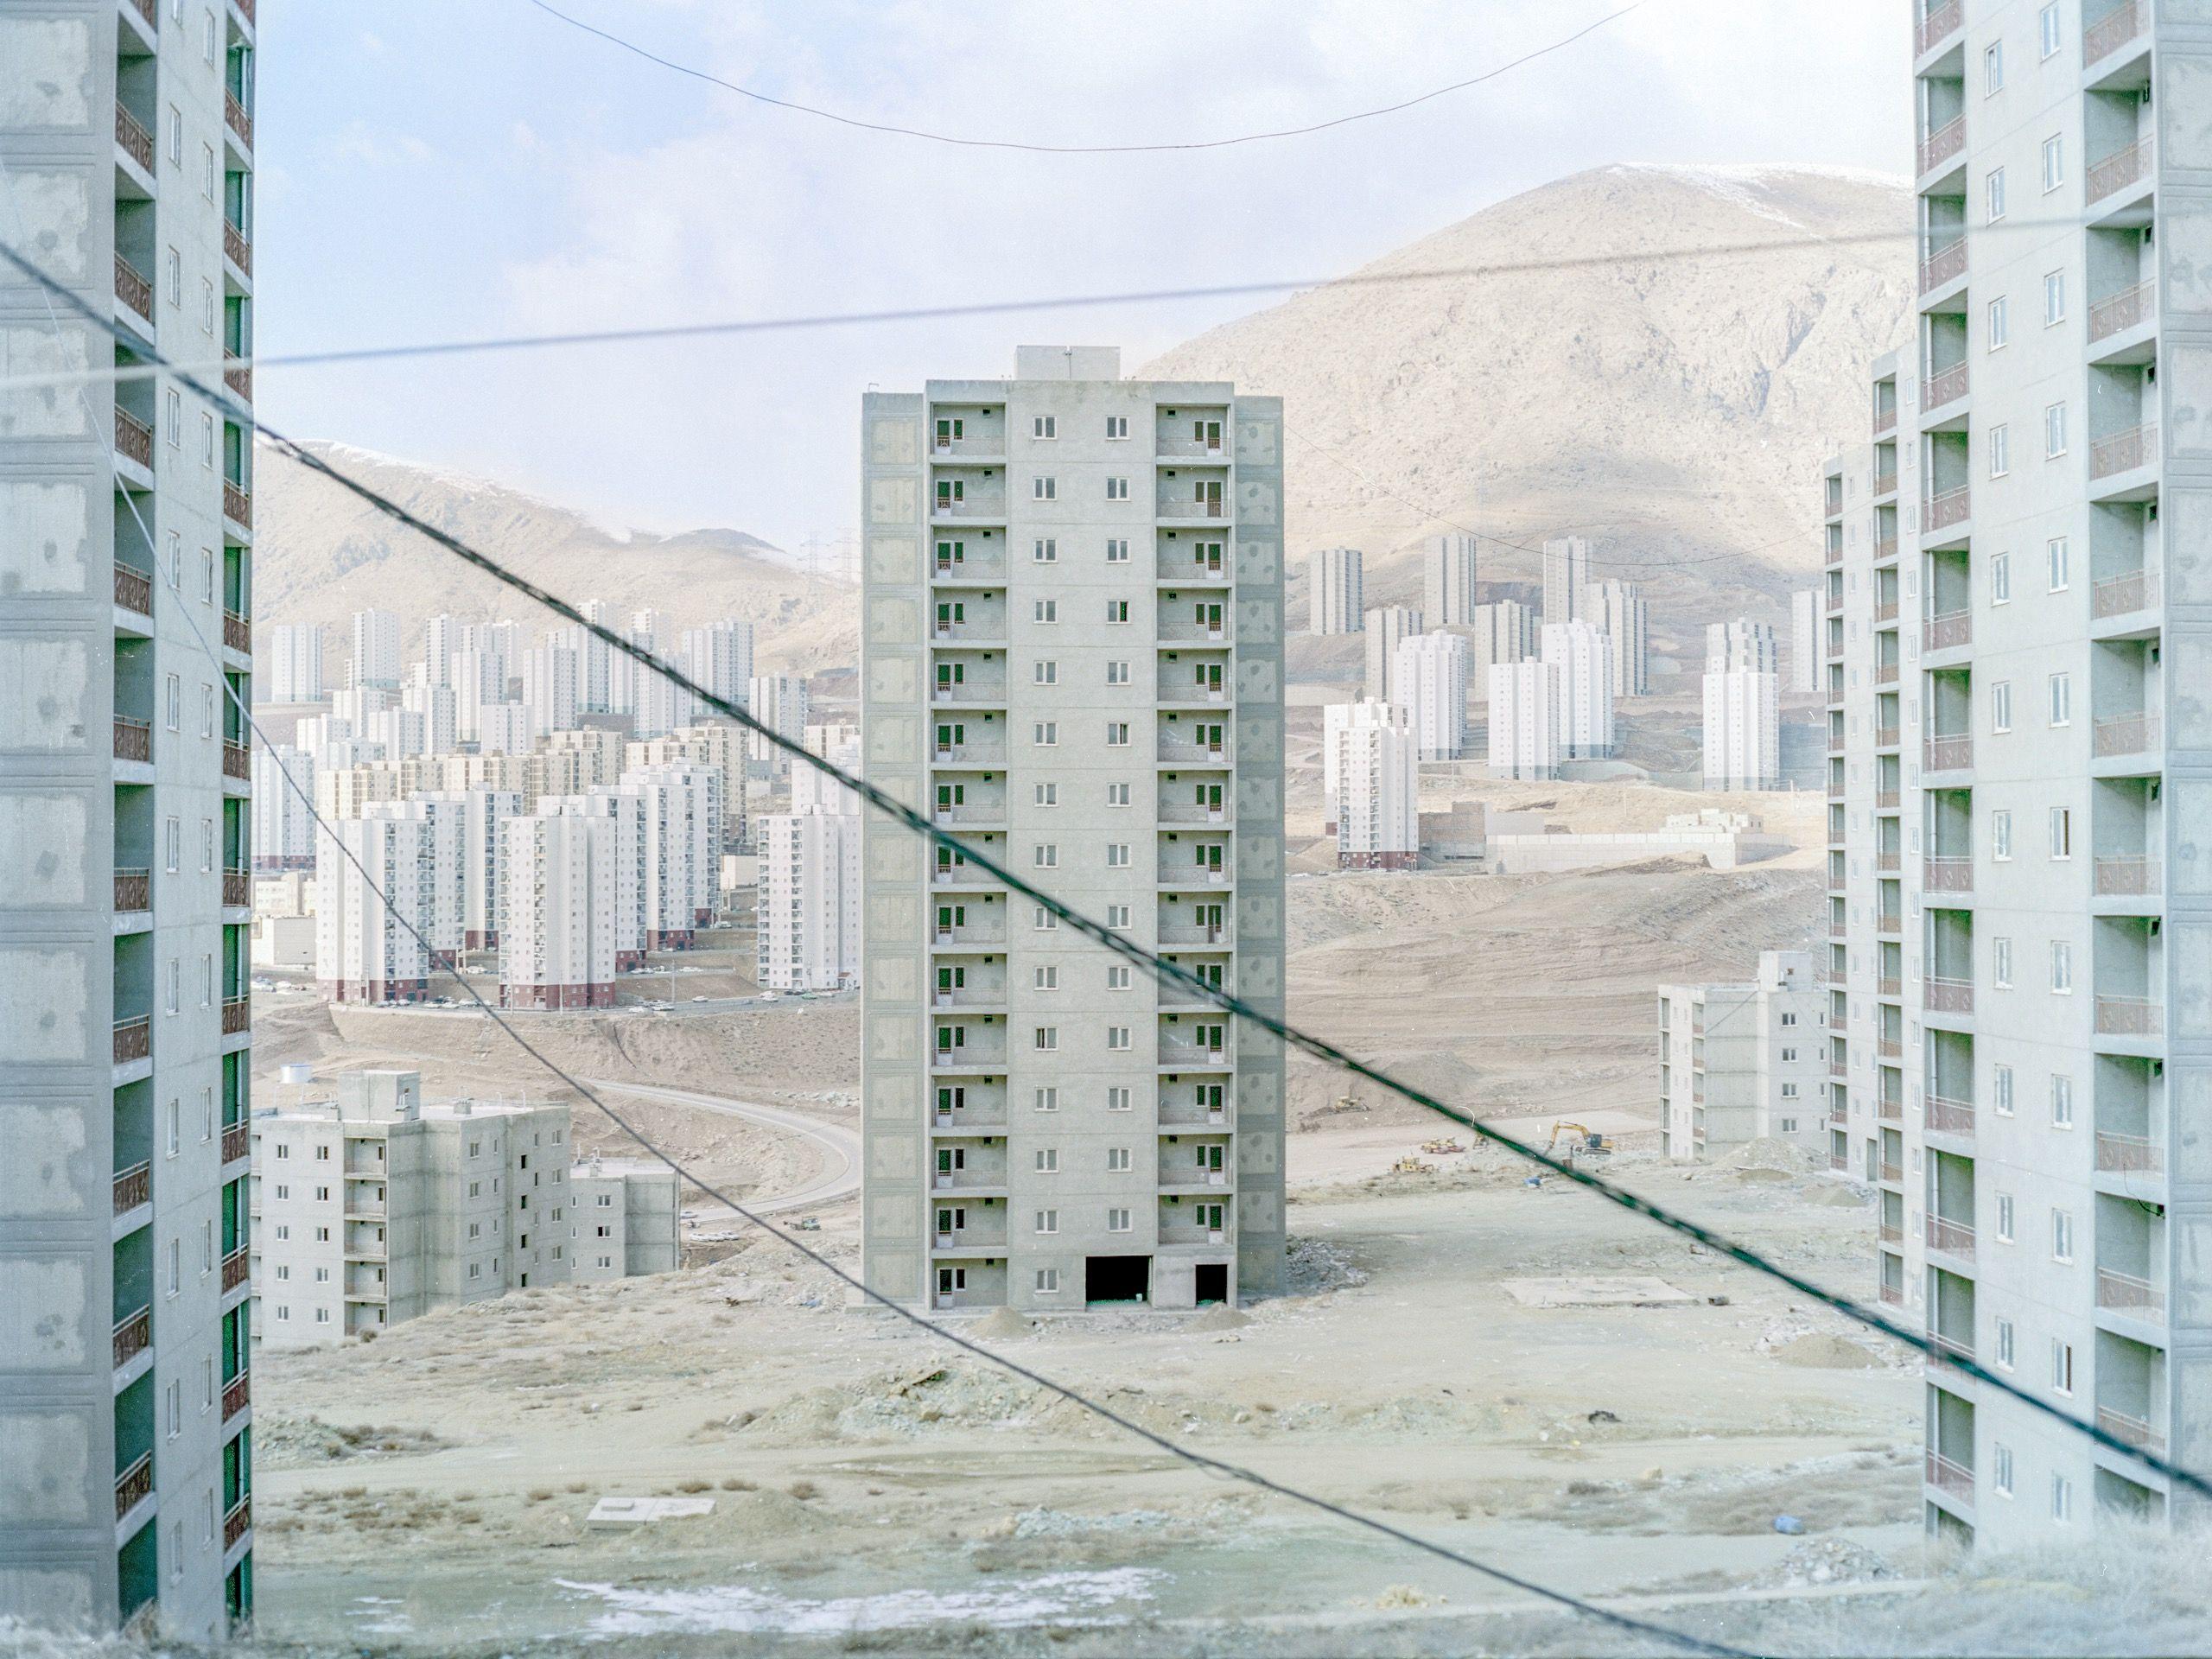 「Hashem Shakeri」的圖片搜尋結果